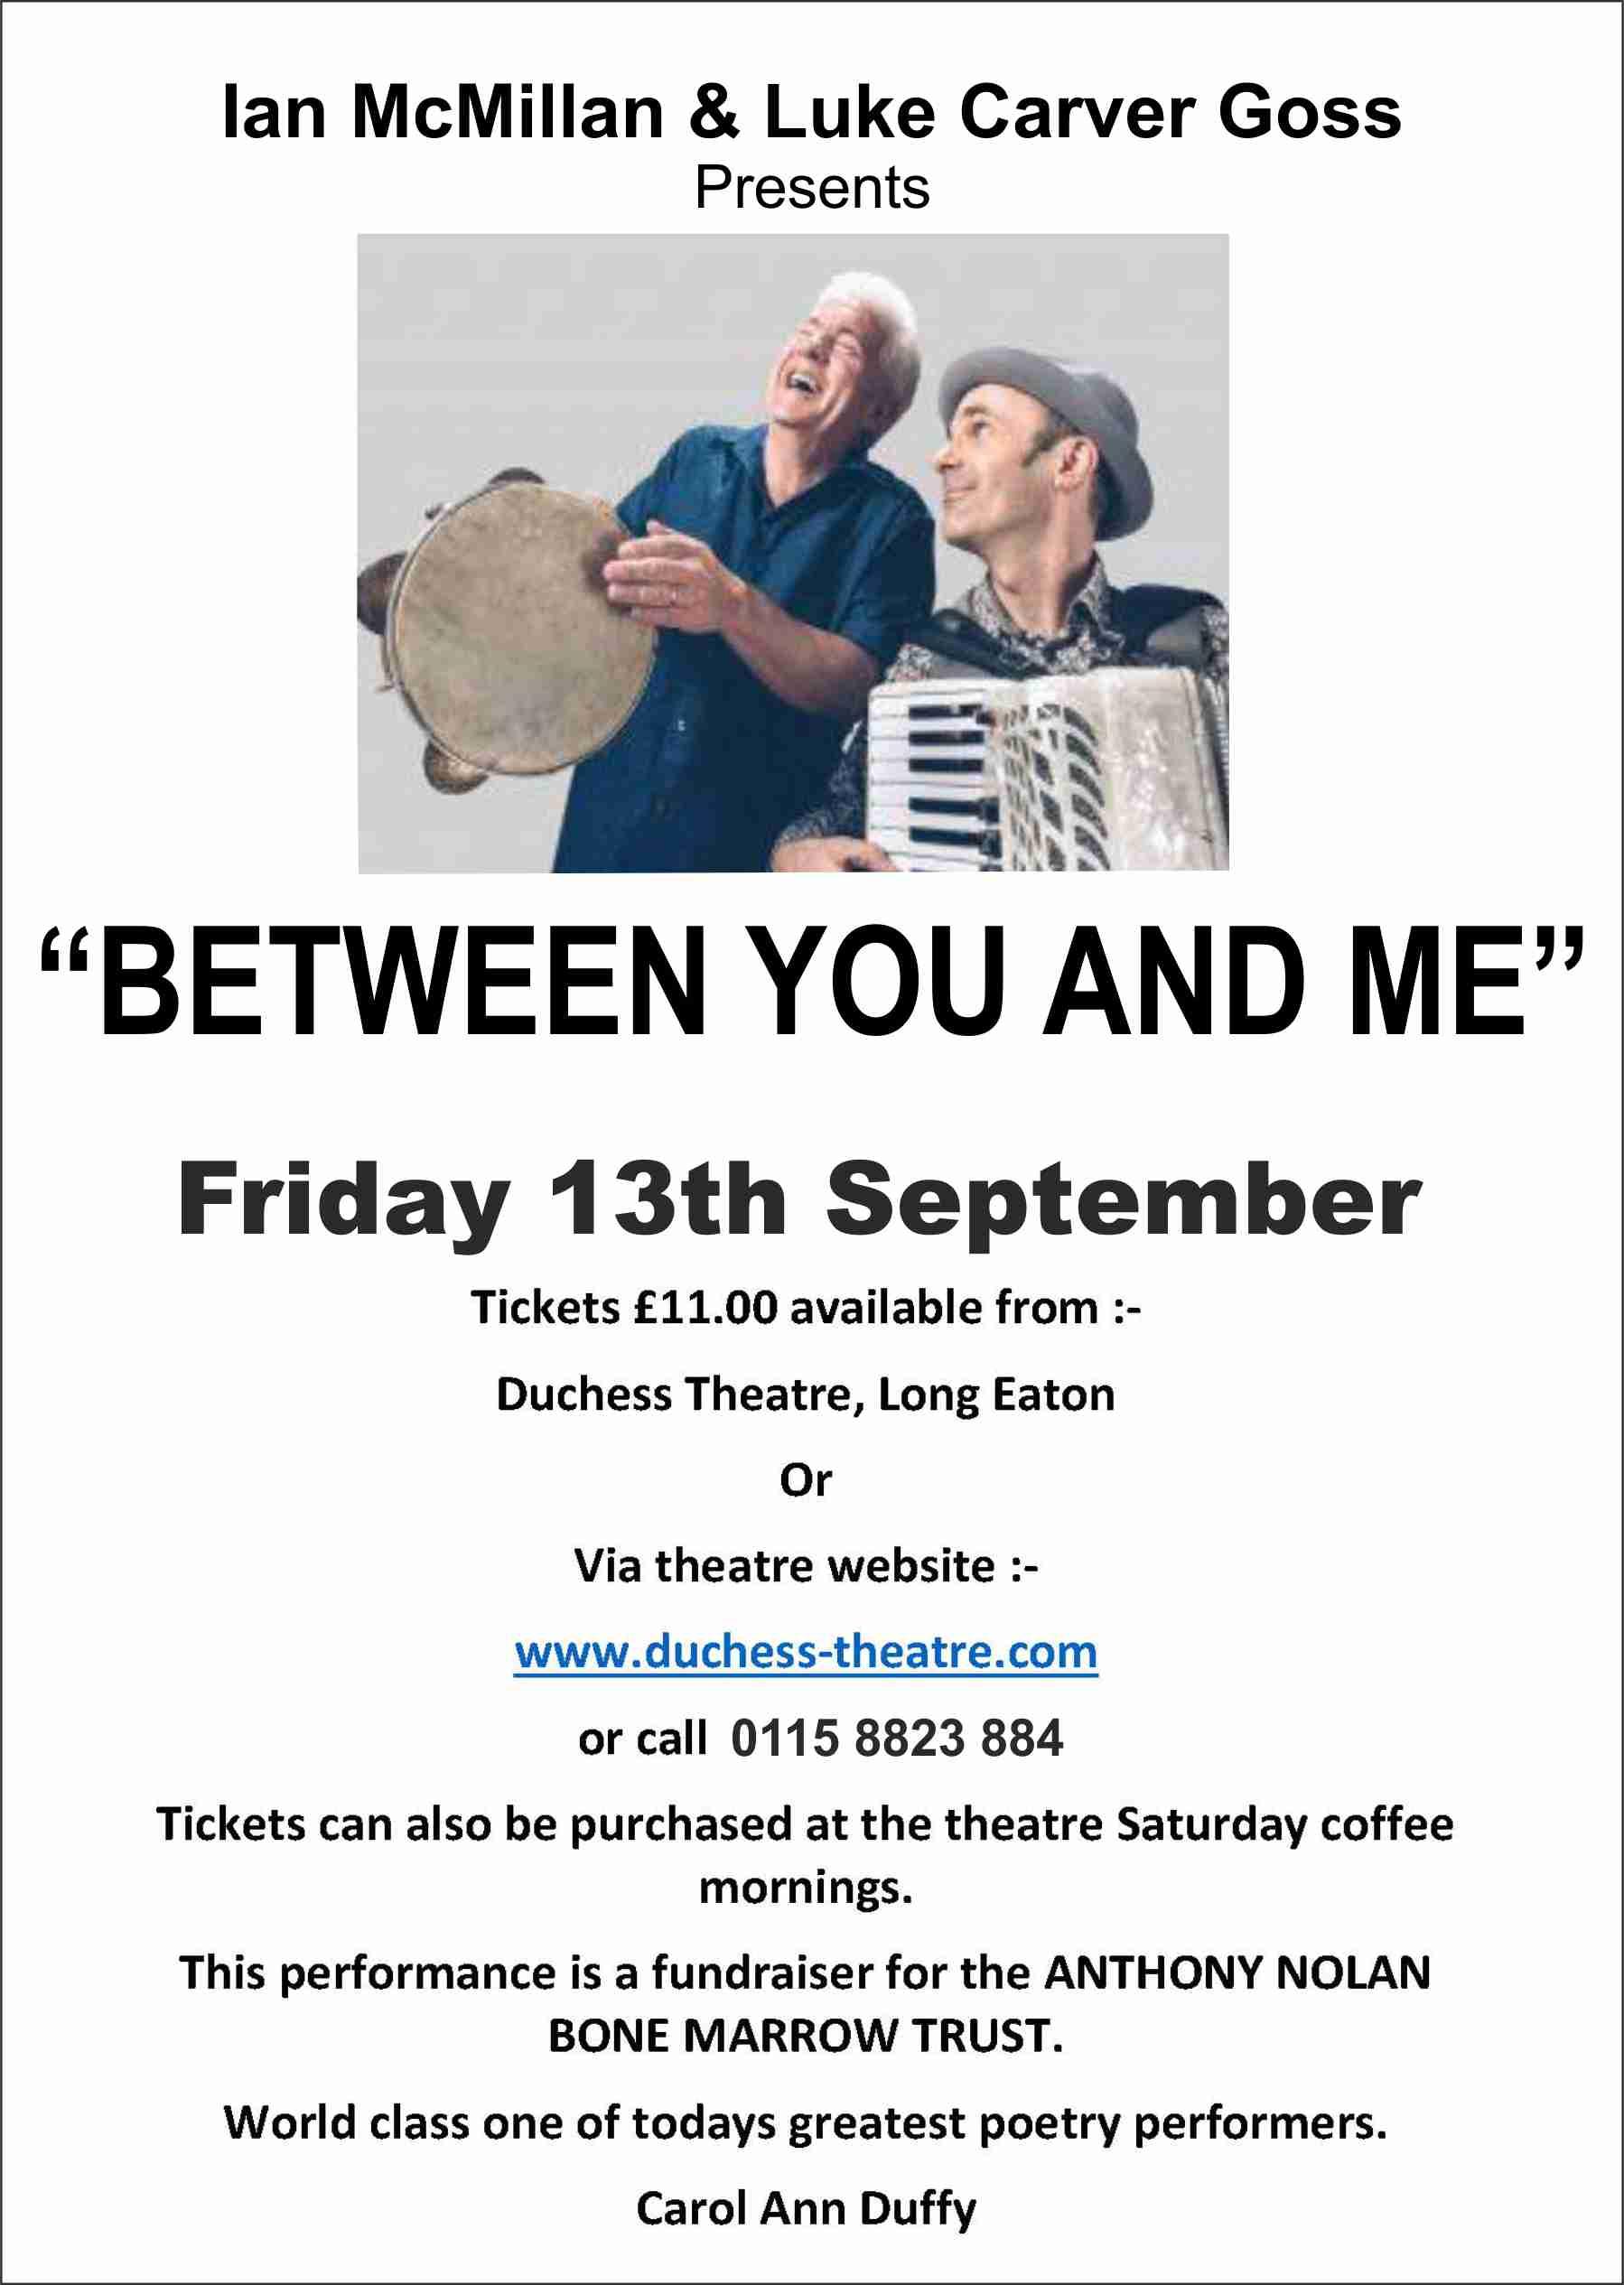 BETWEEN YOU & ME - Ian McMillan & Luke Carver Goss banner image